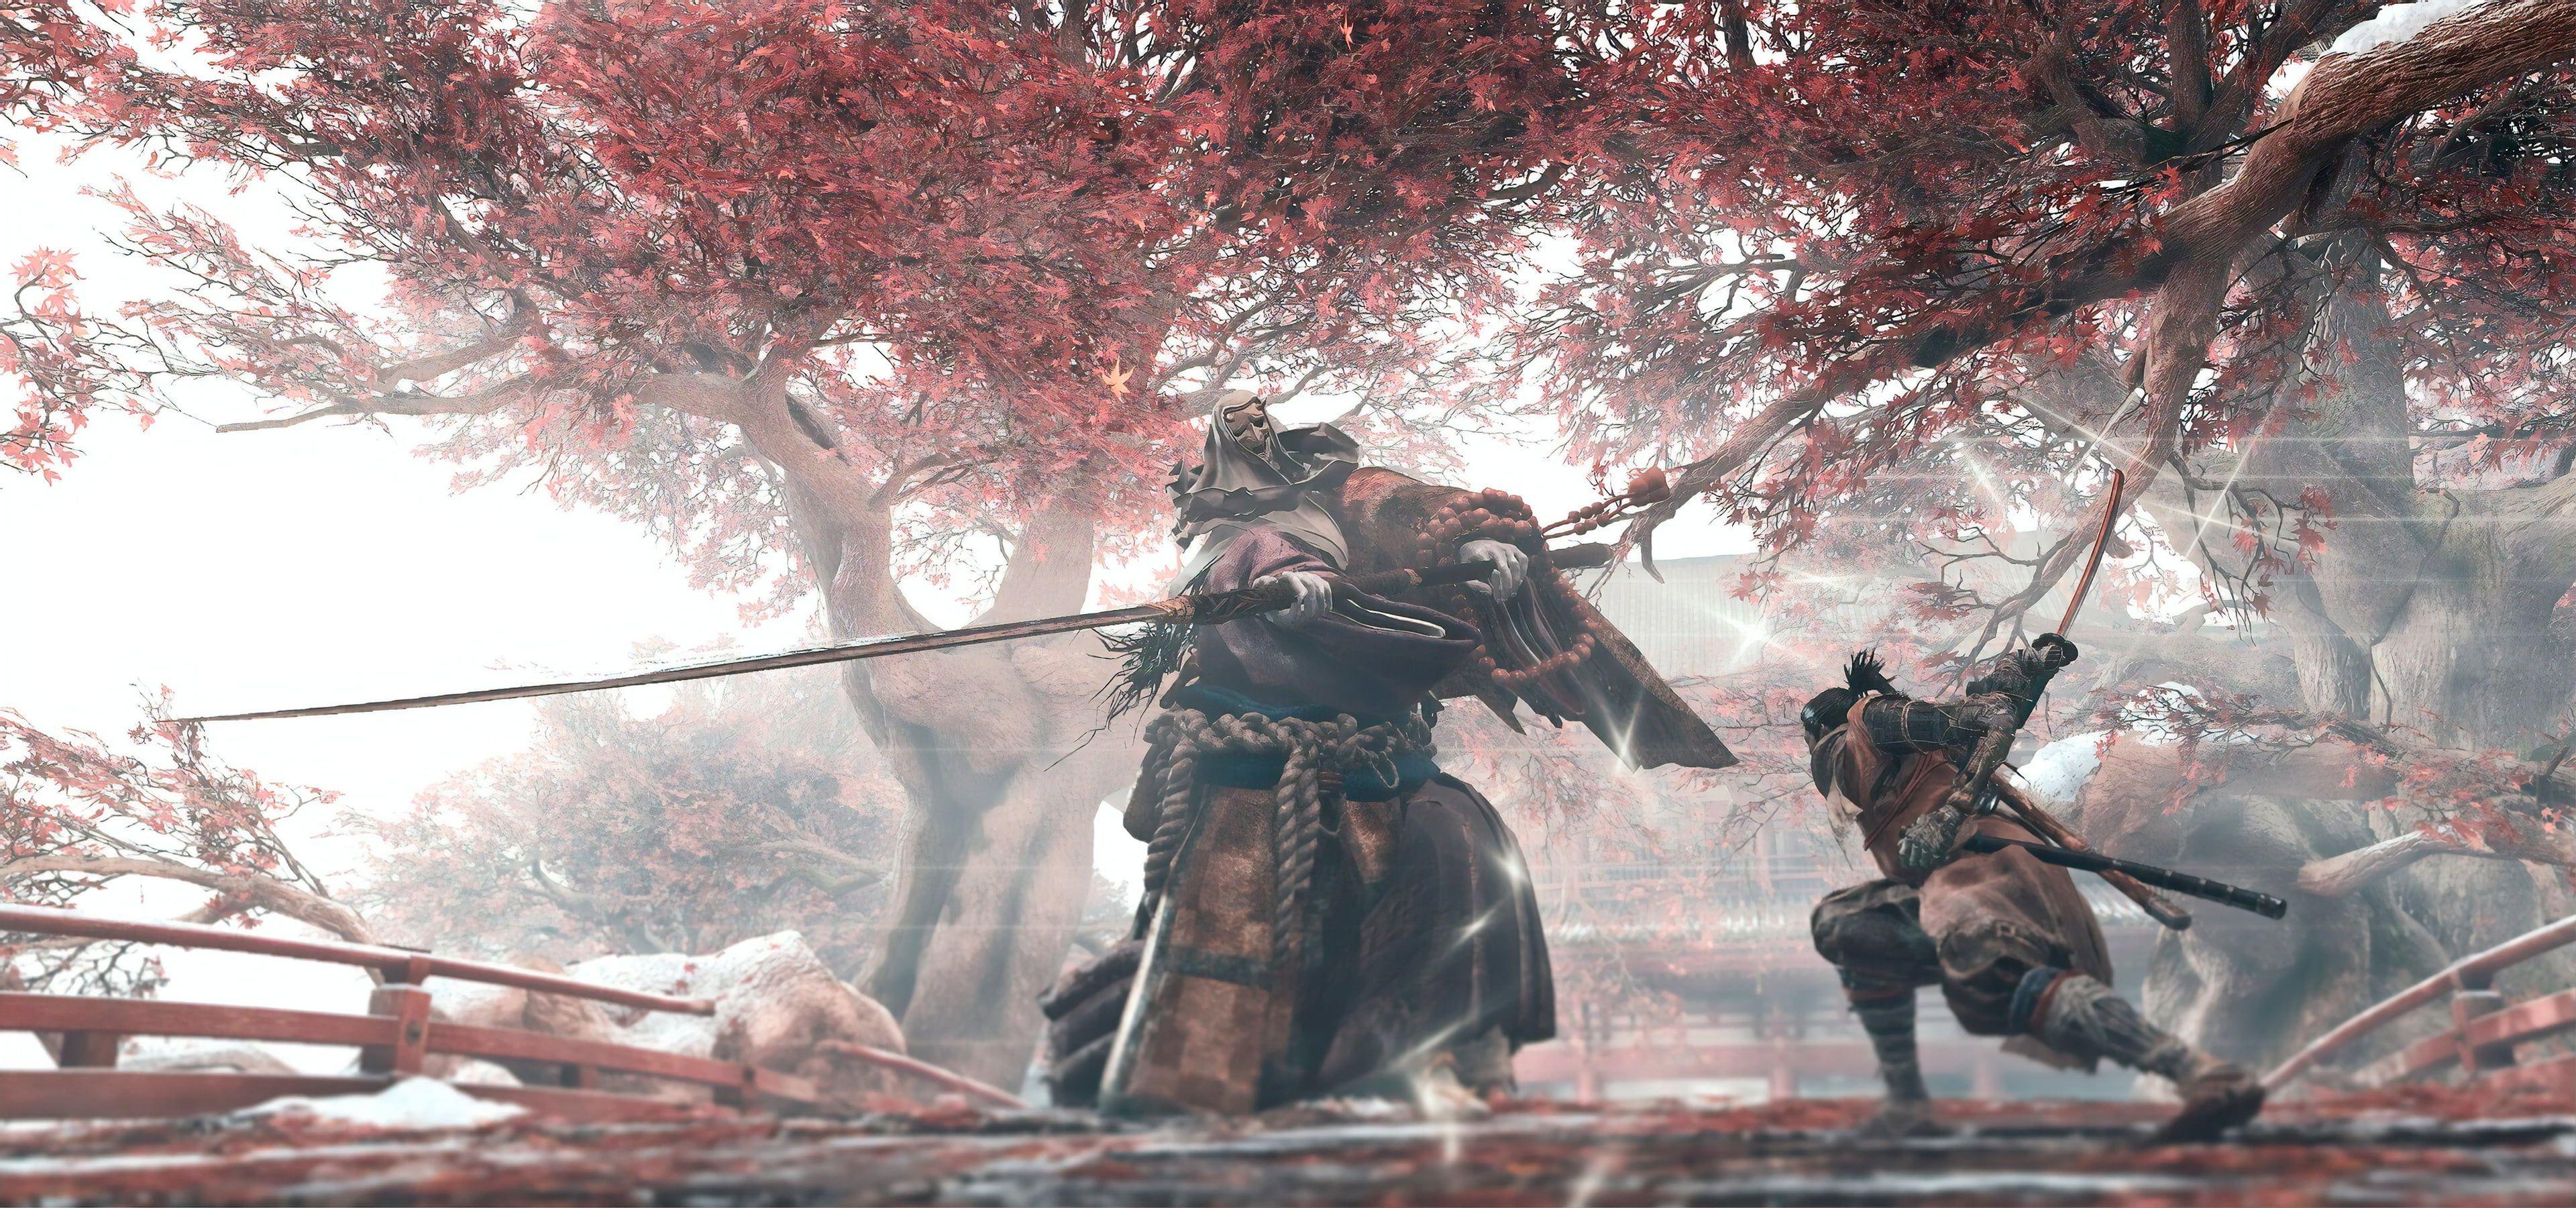 Video Games Video Game Art Sekiro Shadows Die Twice 4k Wallpaper Hdwallpaper Desktop In 2020 Combat Art Game Art Art